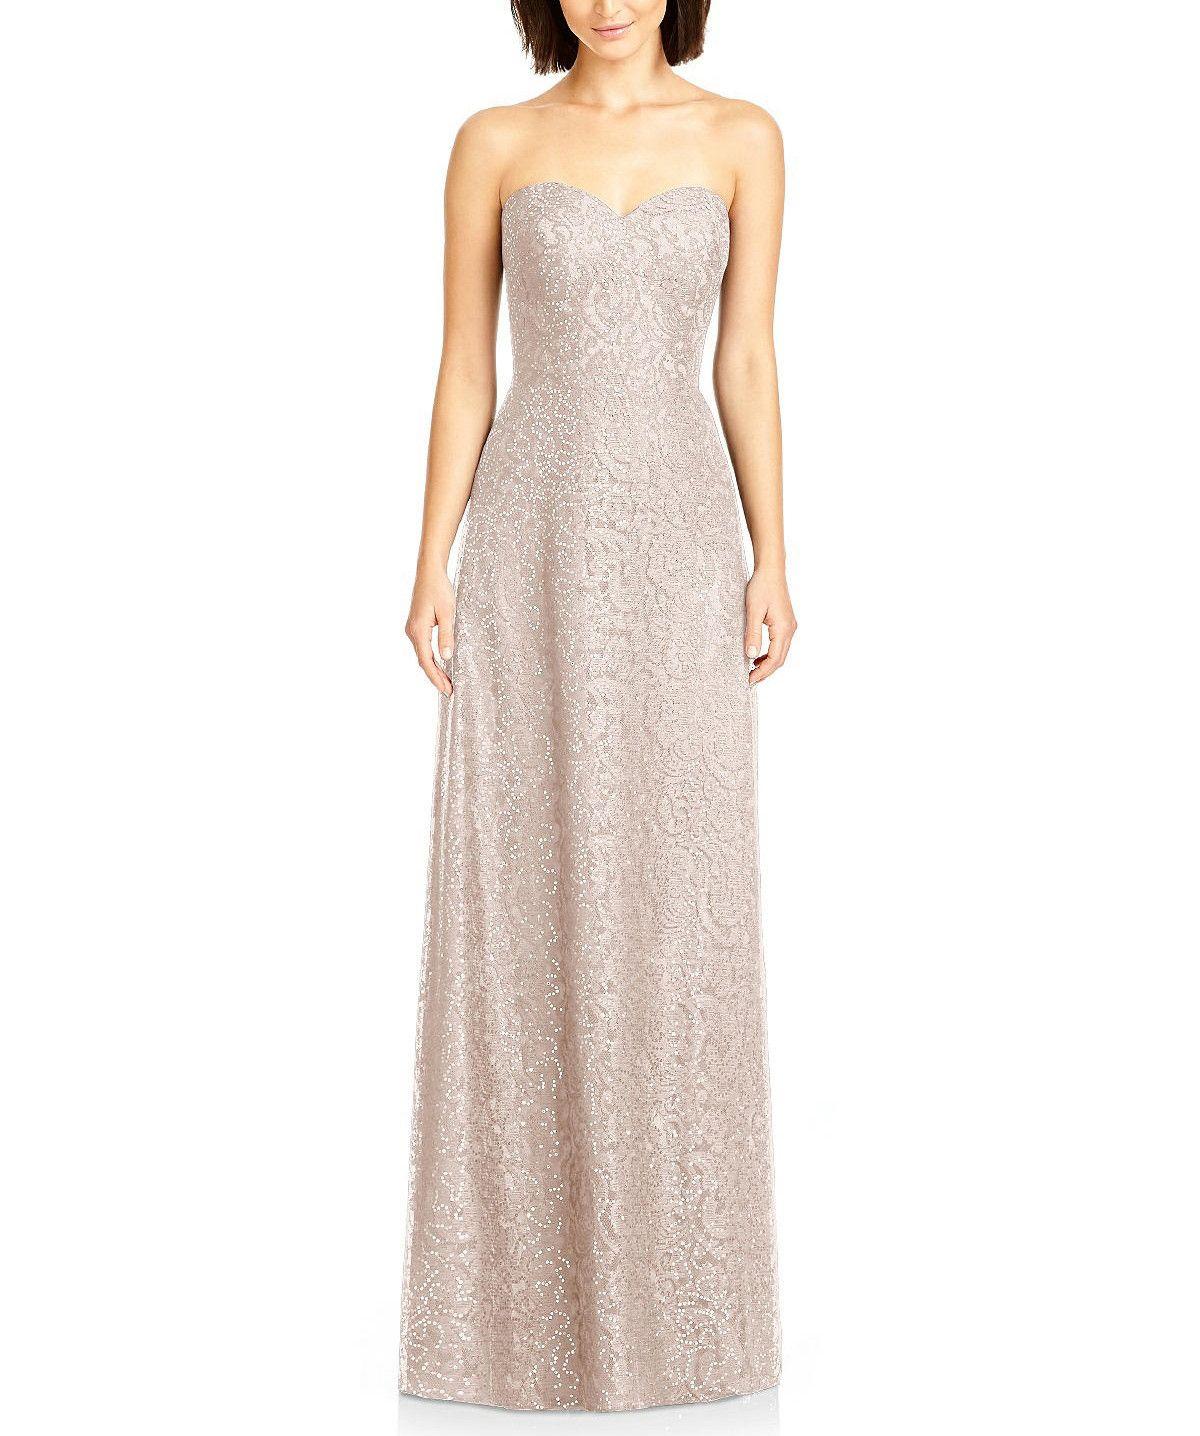 Descriptiondessy style full length bridesmaid dressstrapless